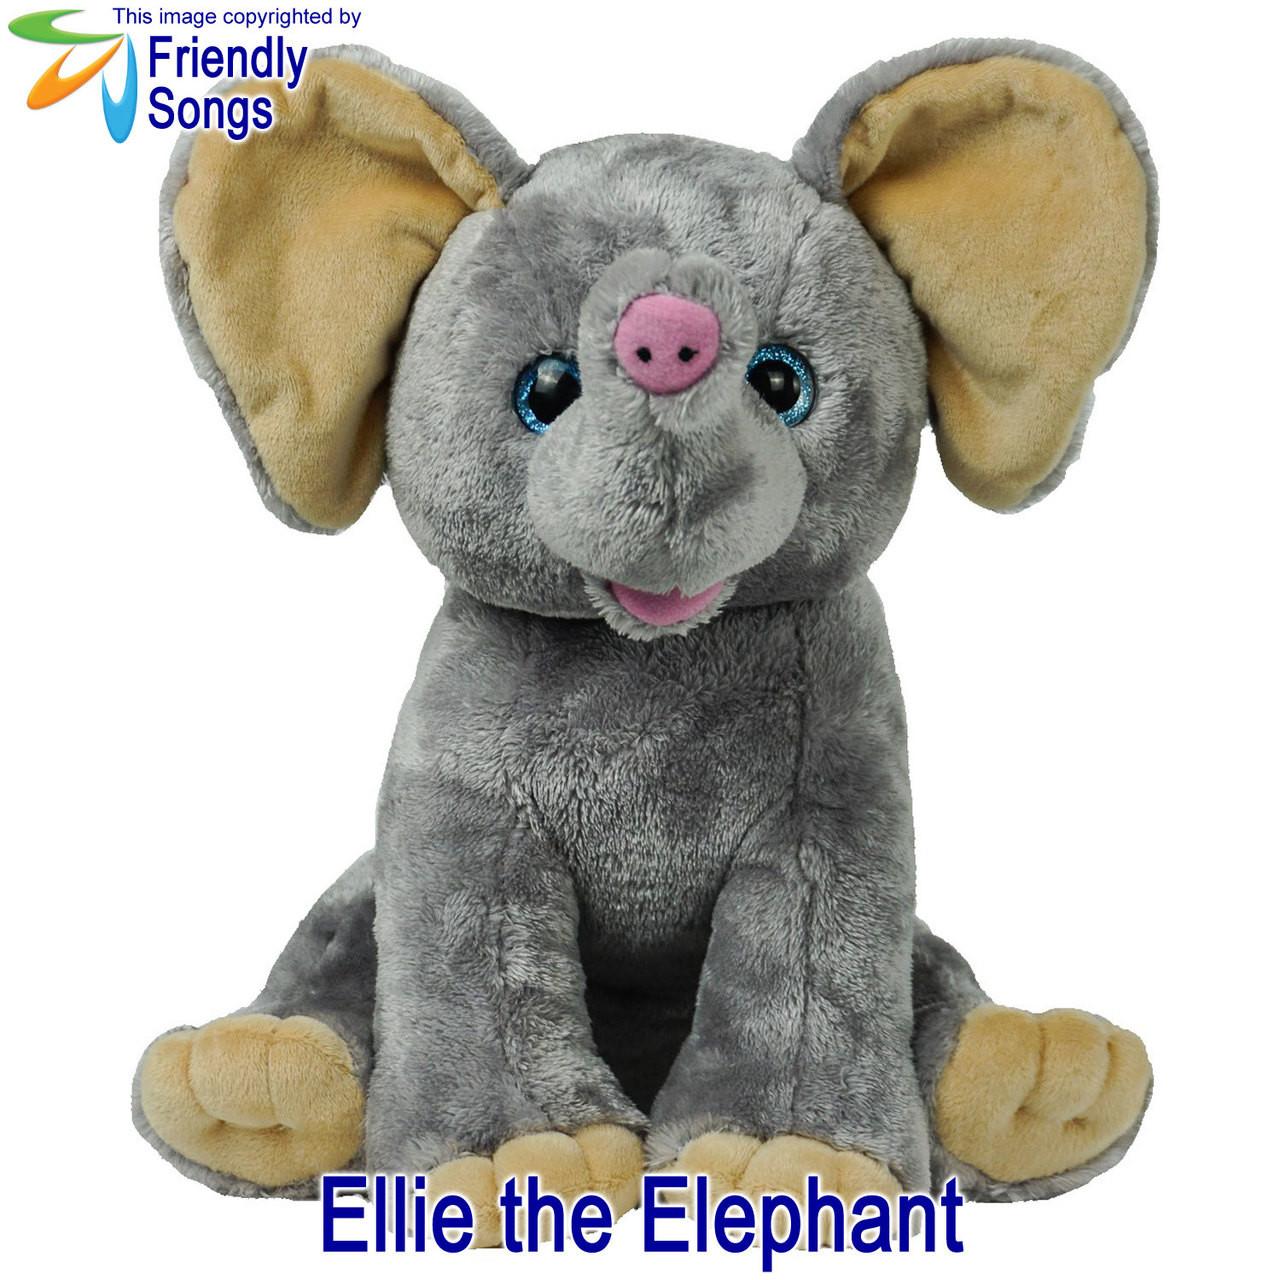 Ellie the Elephant Personalized Stuffed Animal